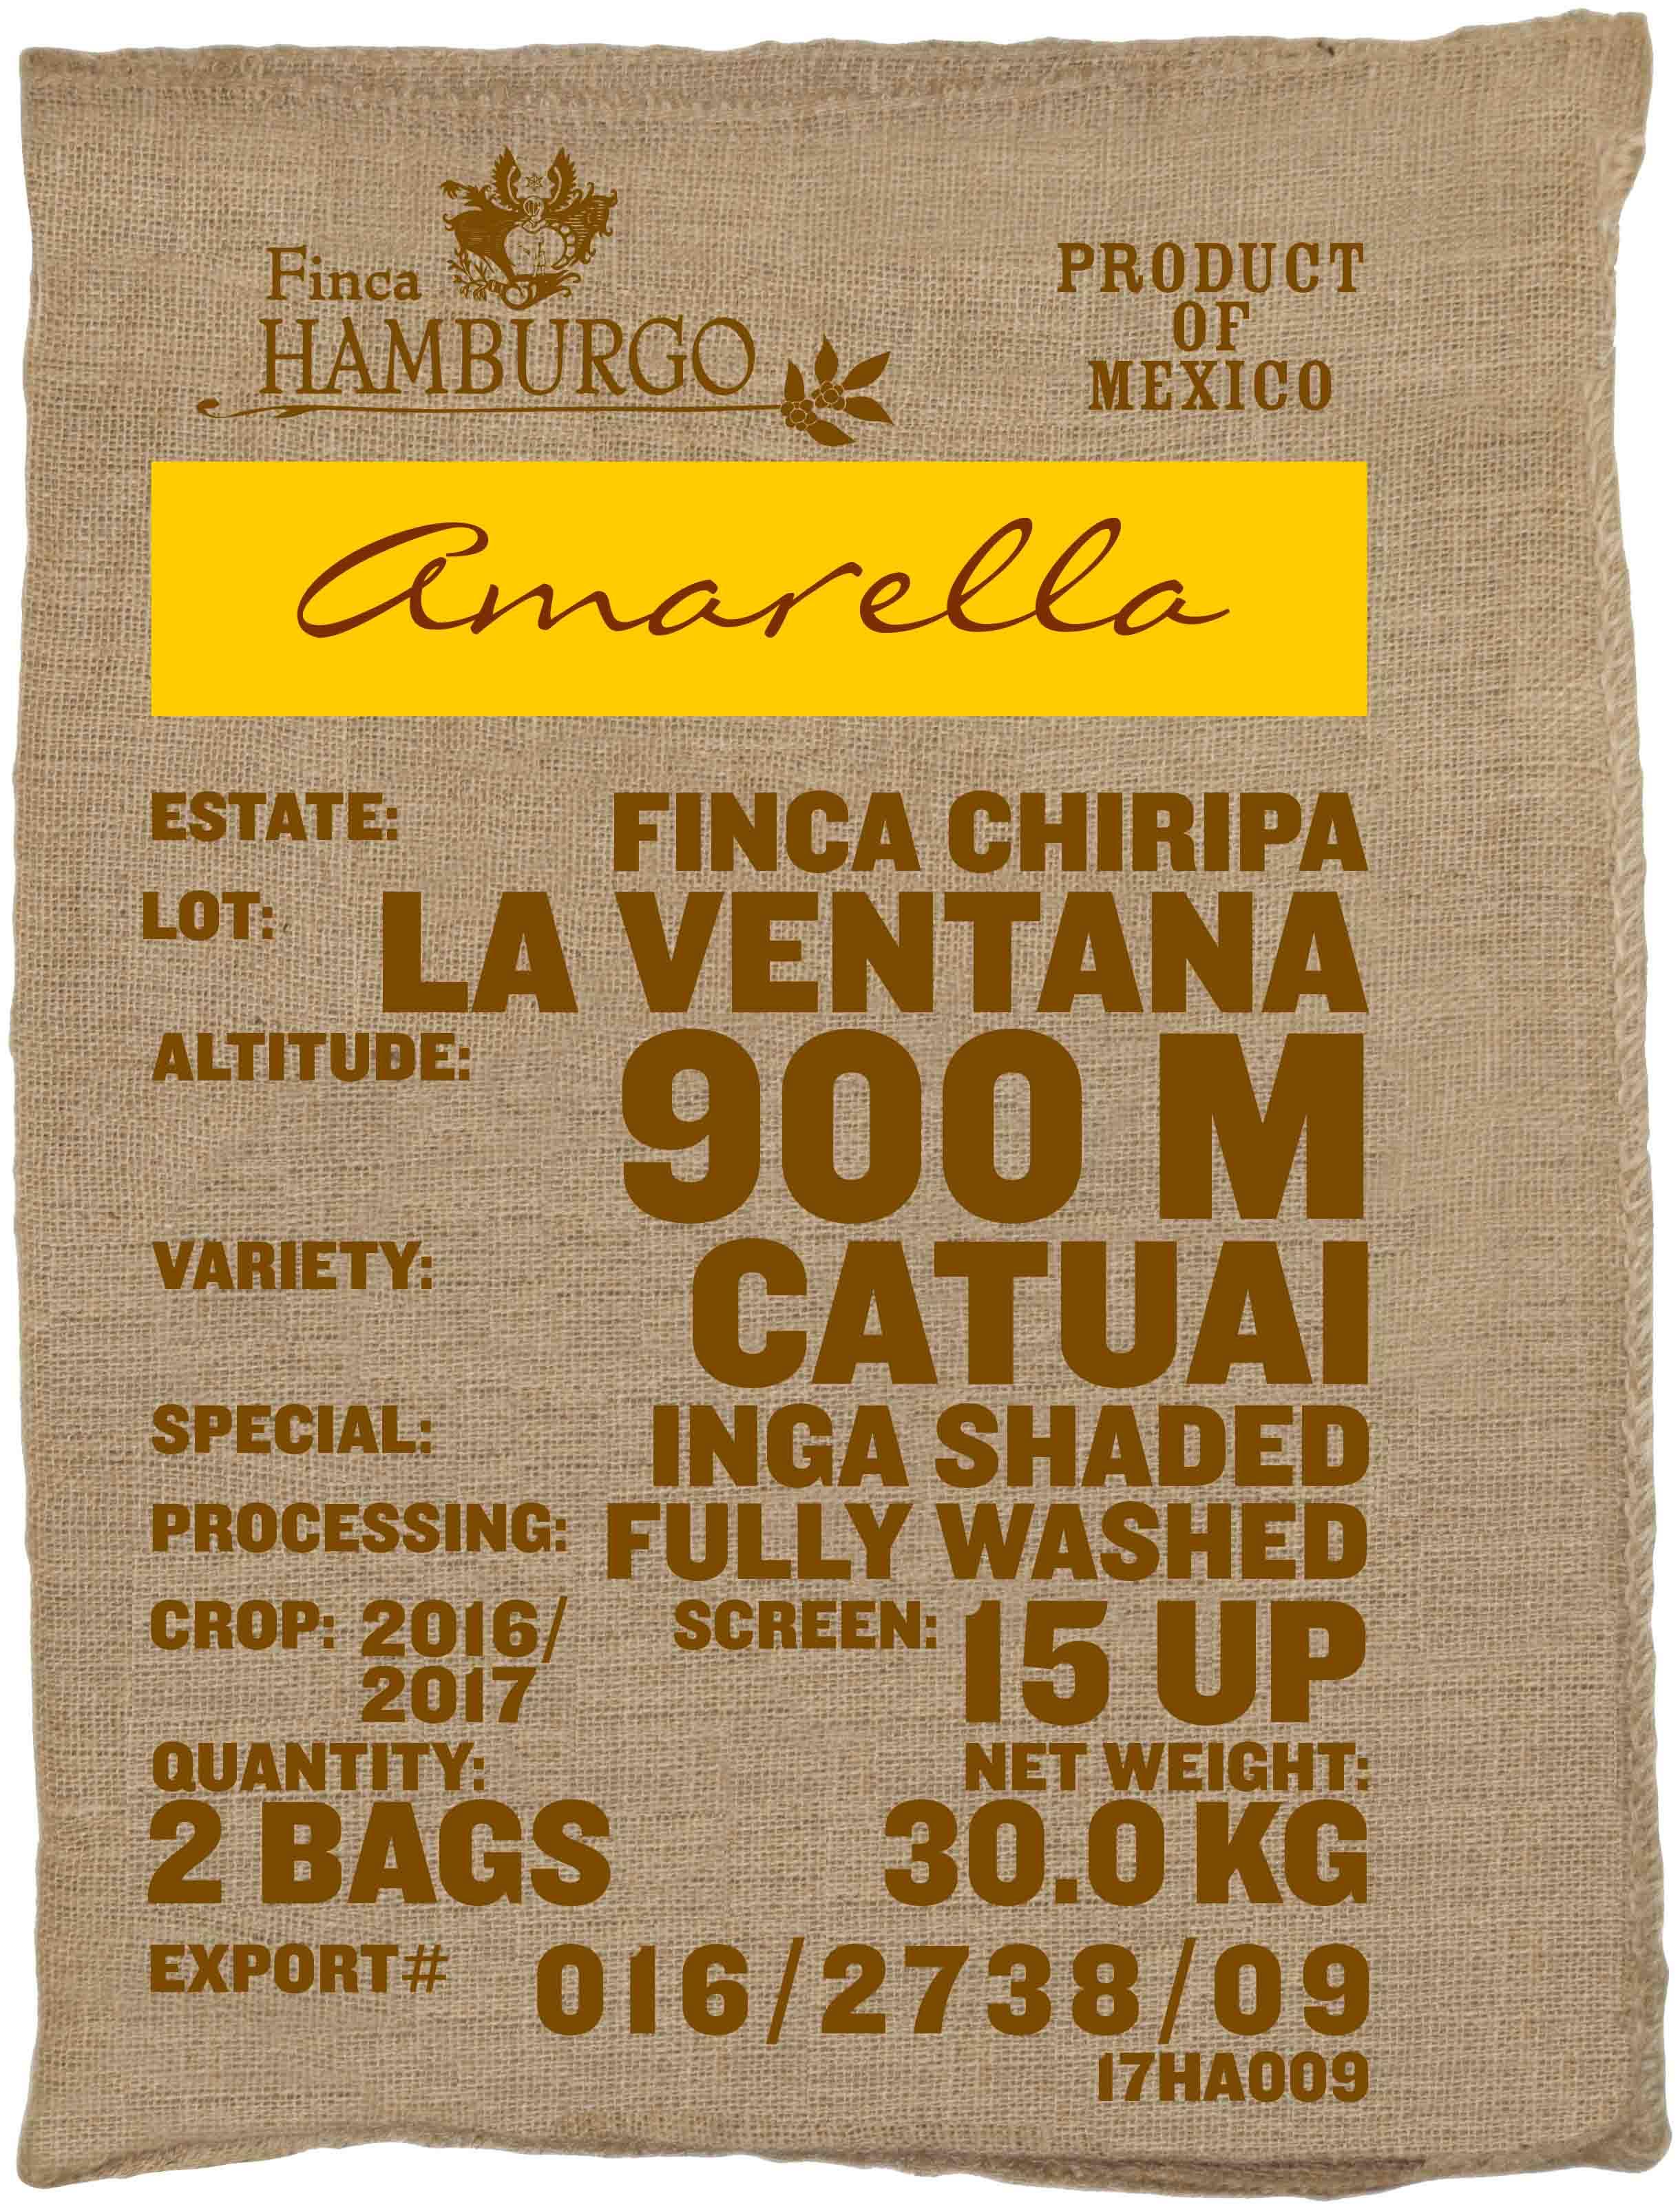 Ein Rohkaffeesack amarella Parzellenkaffee Varietät Catuai. Finca Chiripa Lot La Ventana.